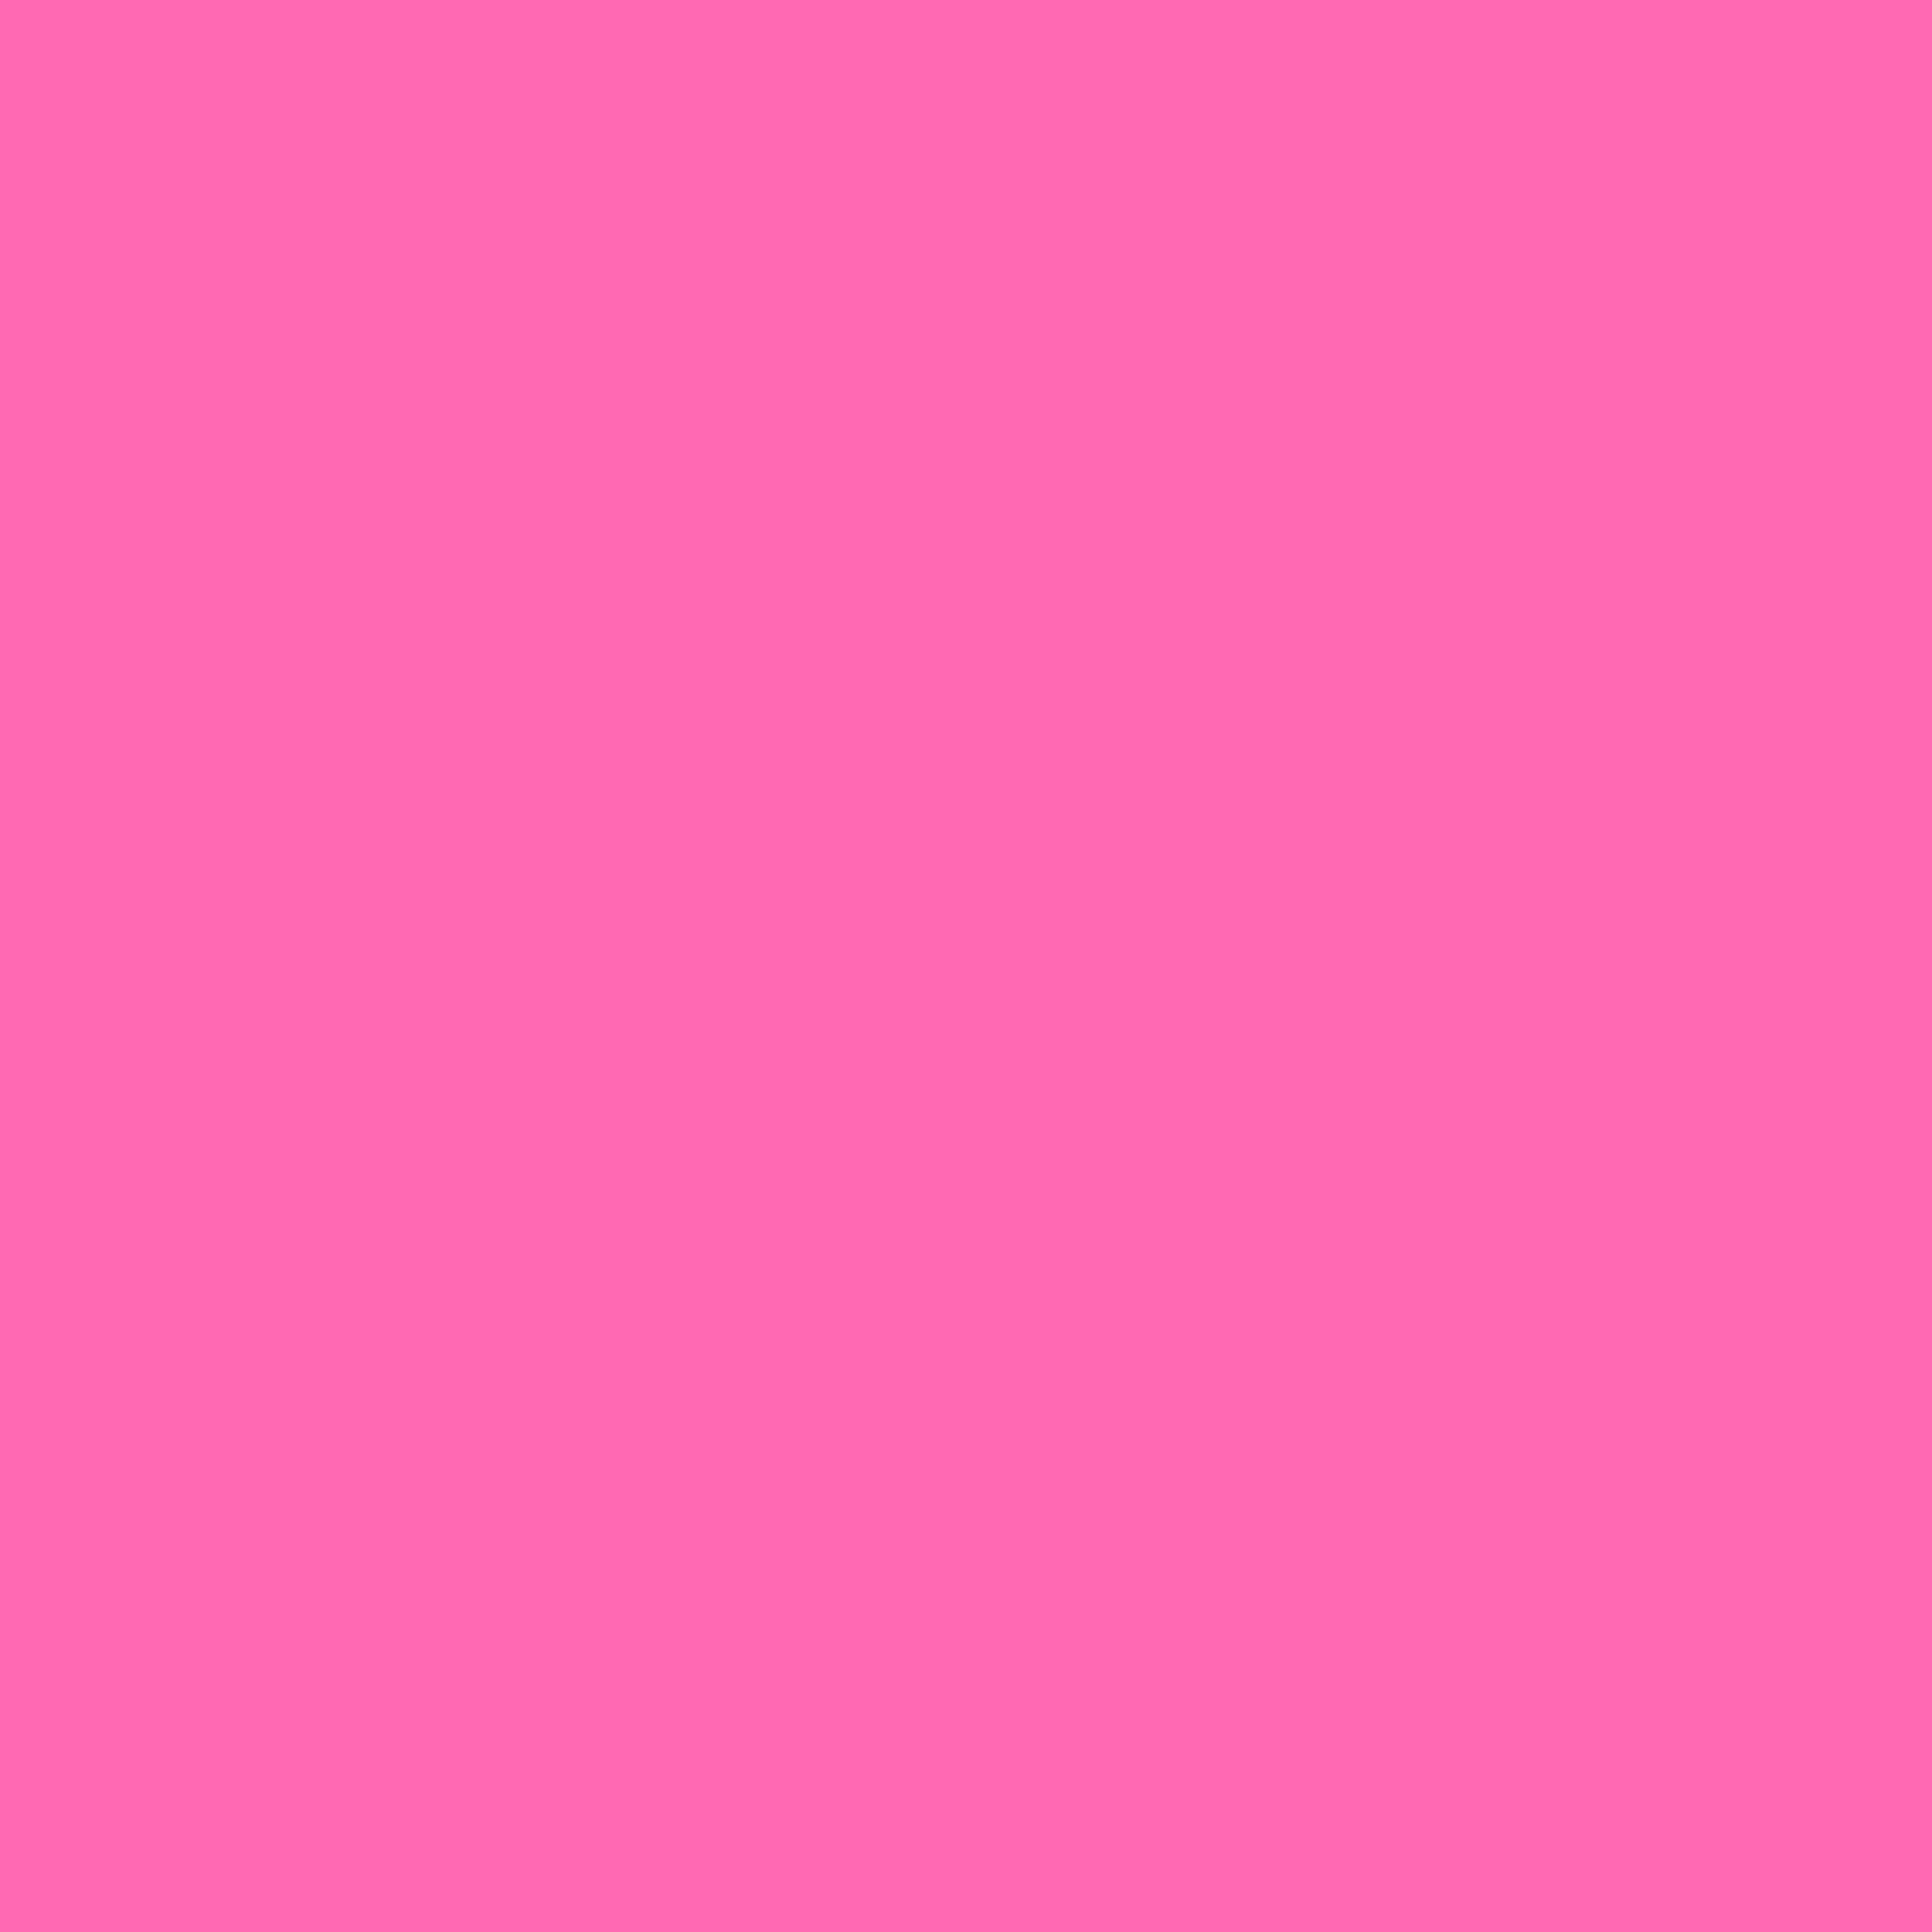 pink wallpaper pink background 2048x2048